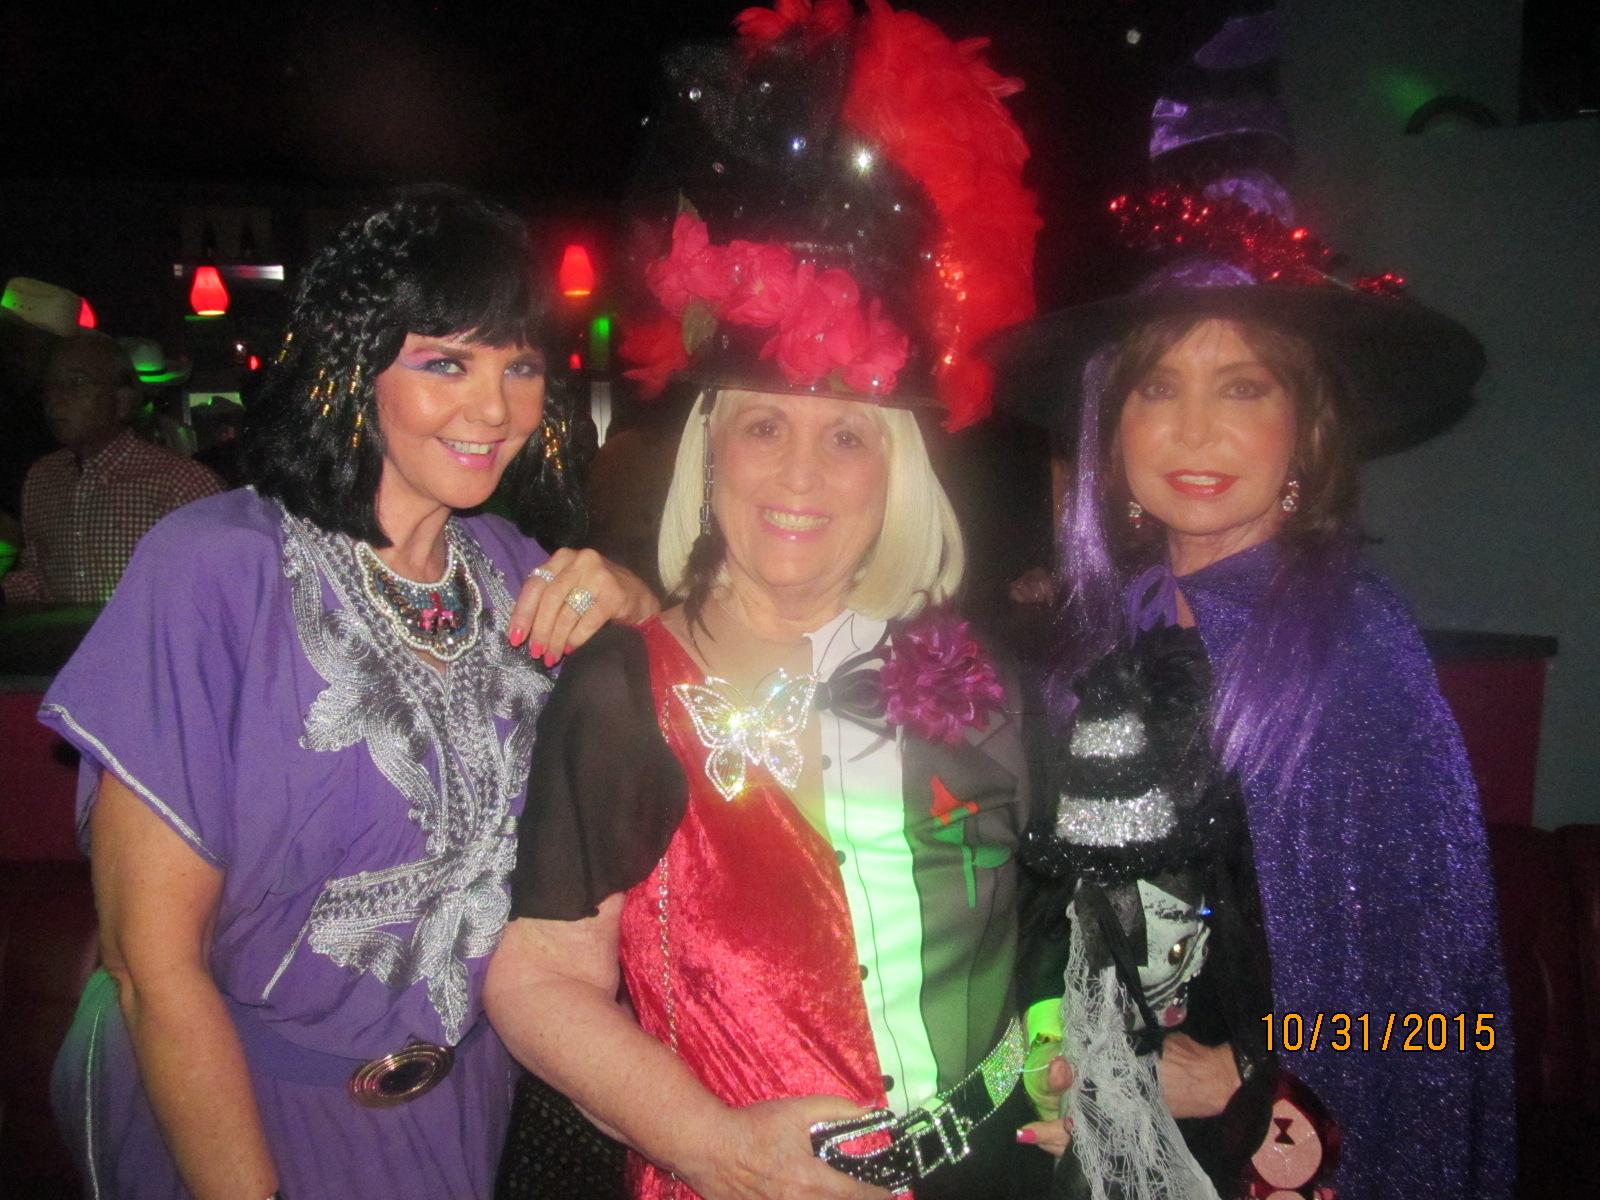 Halloween Party at Sakred Nightclub - Boca Raton News Most ...